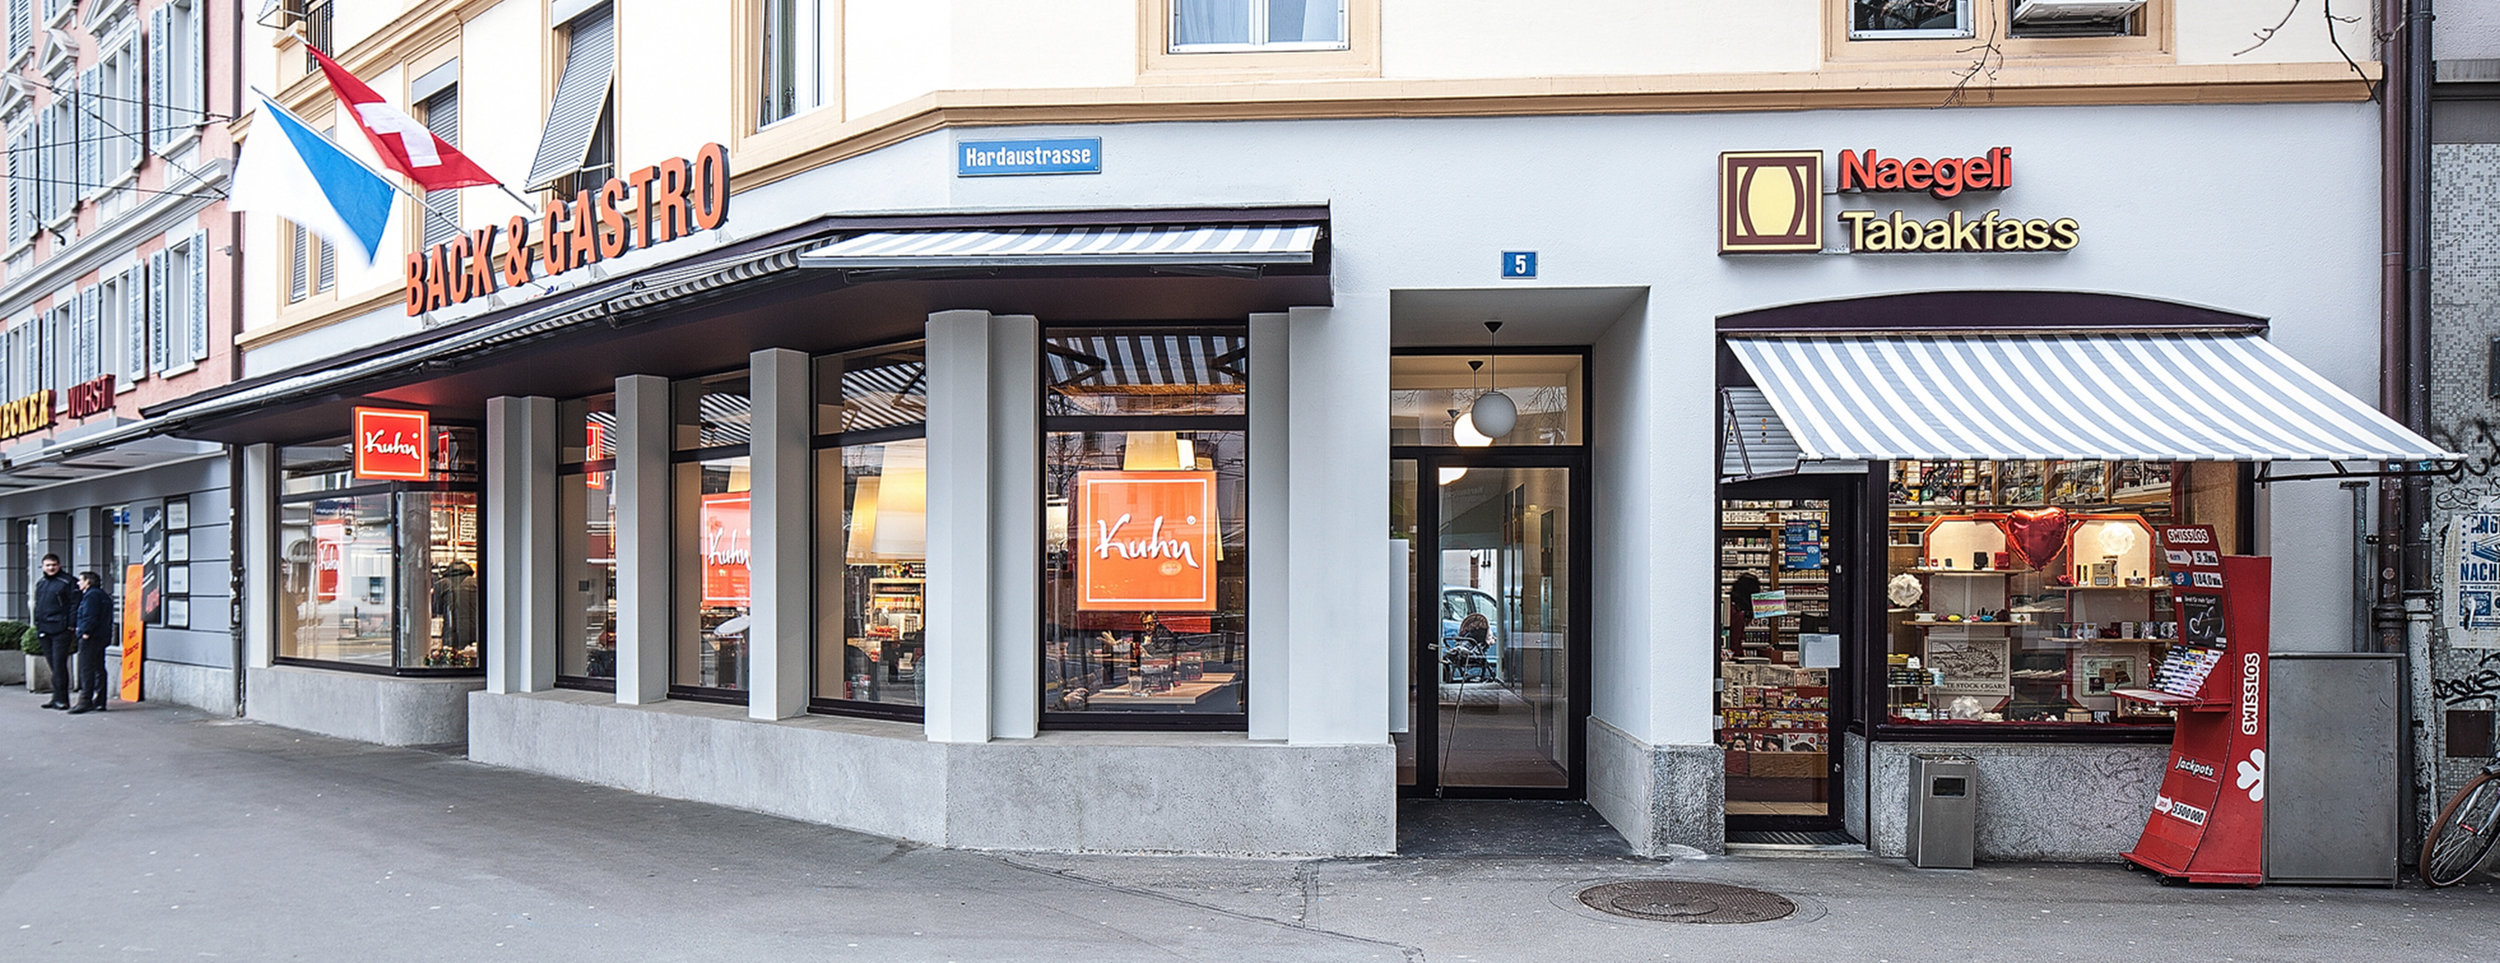 180215_Fertigstellung Hardausstrasse.jpg